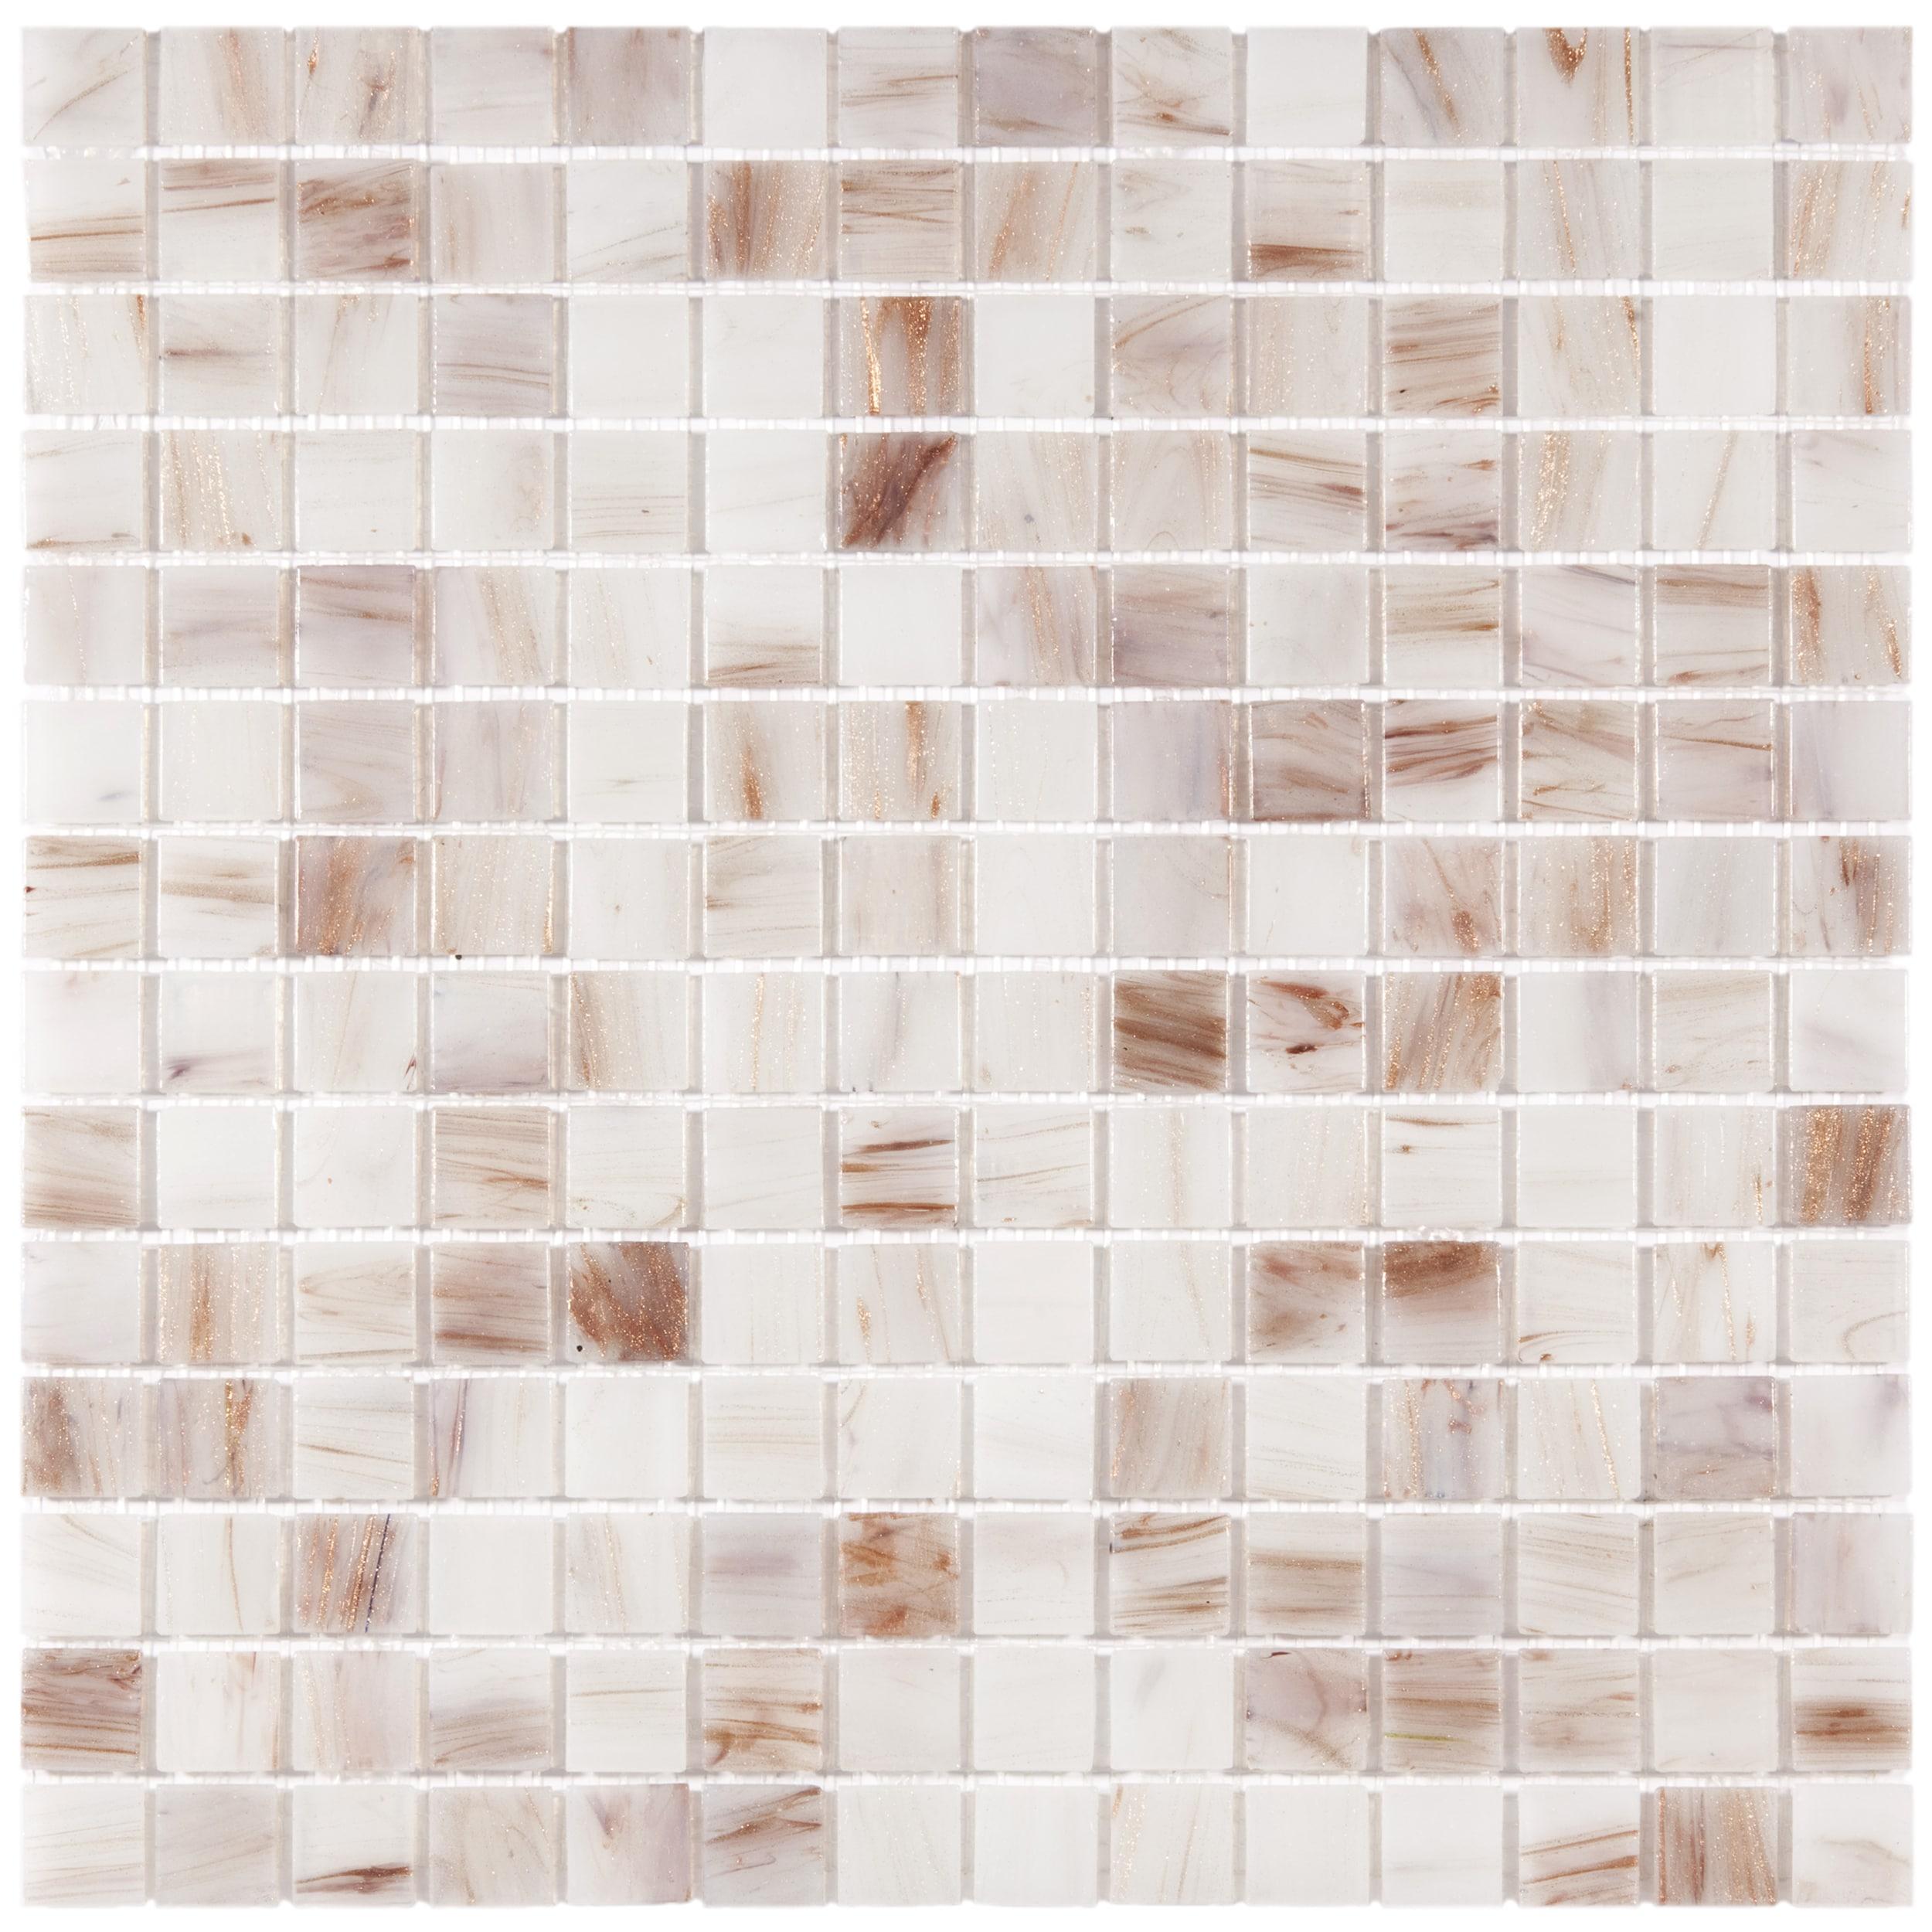 Mosaic Tiles Manufacturers Mosaic Tile Case of 13